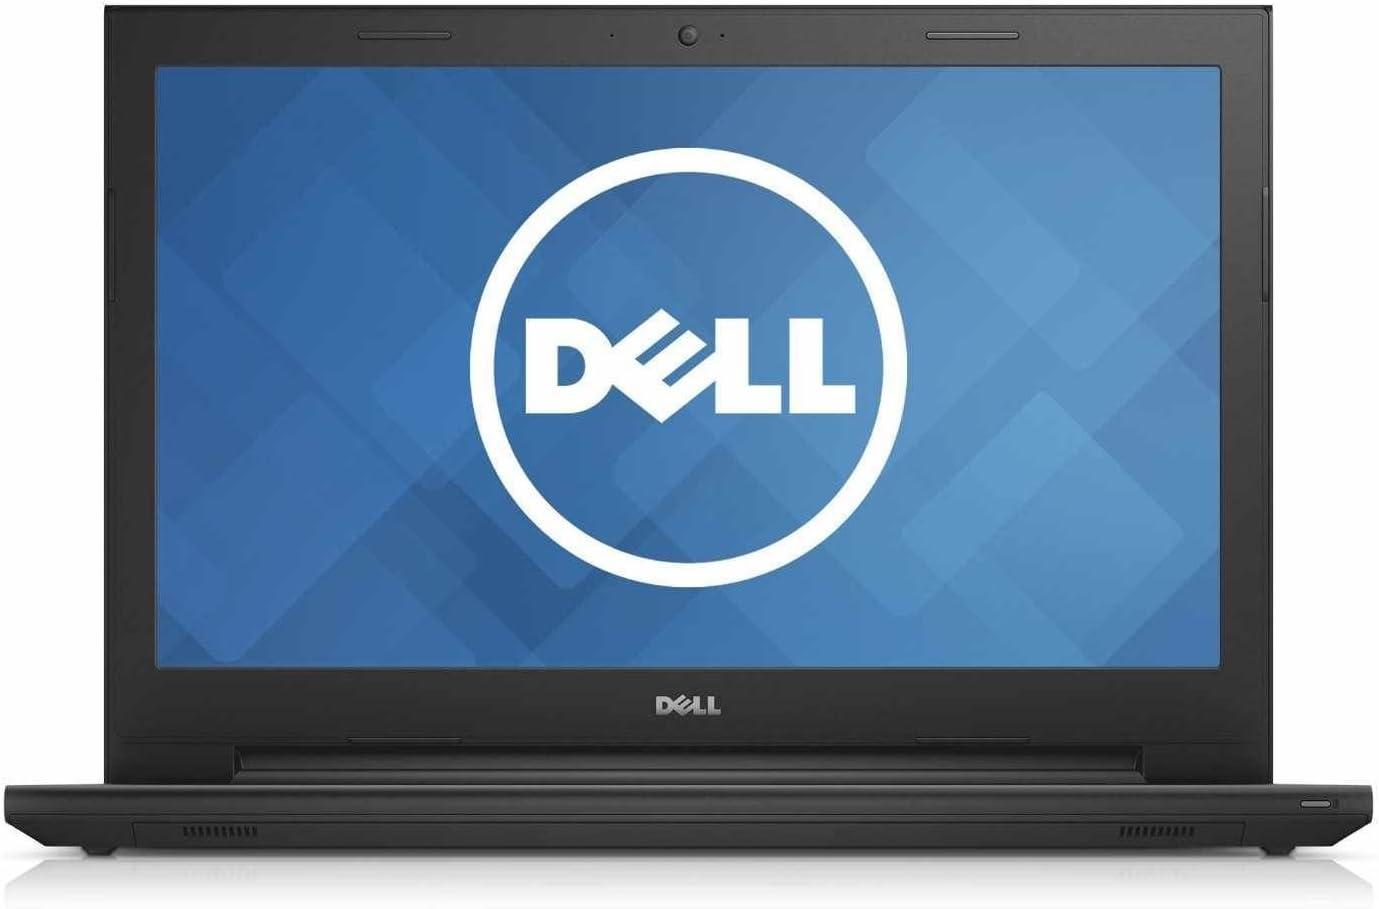 "Dell Inspiron 15 i3541-2002BLK 15.6"" Laptop (Amd A6 6310, 4GB RAM, 500GB)"